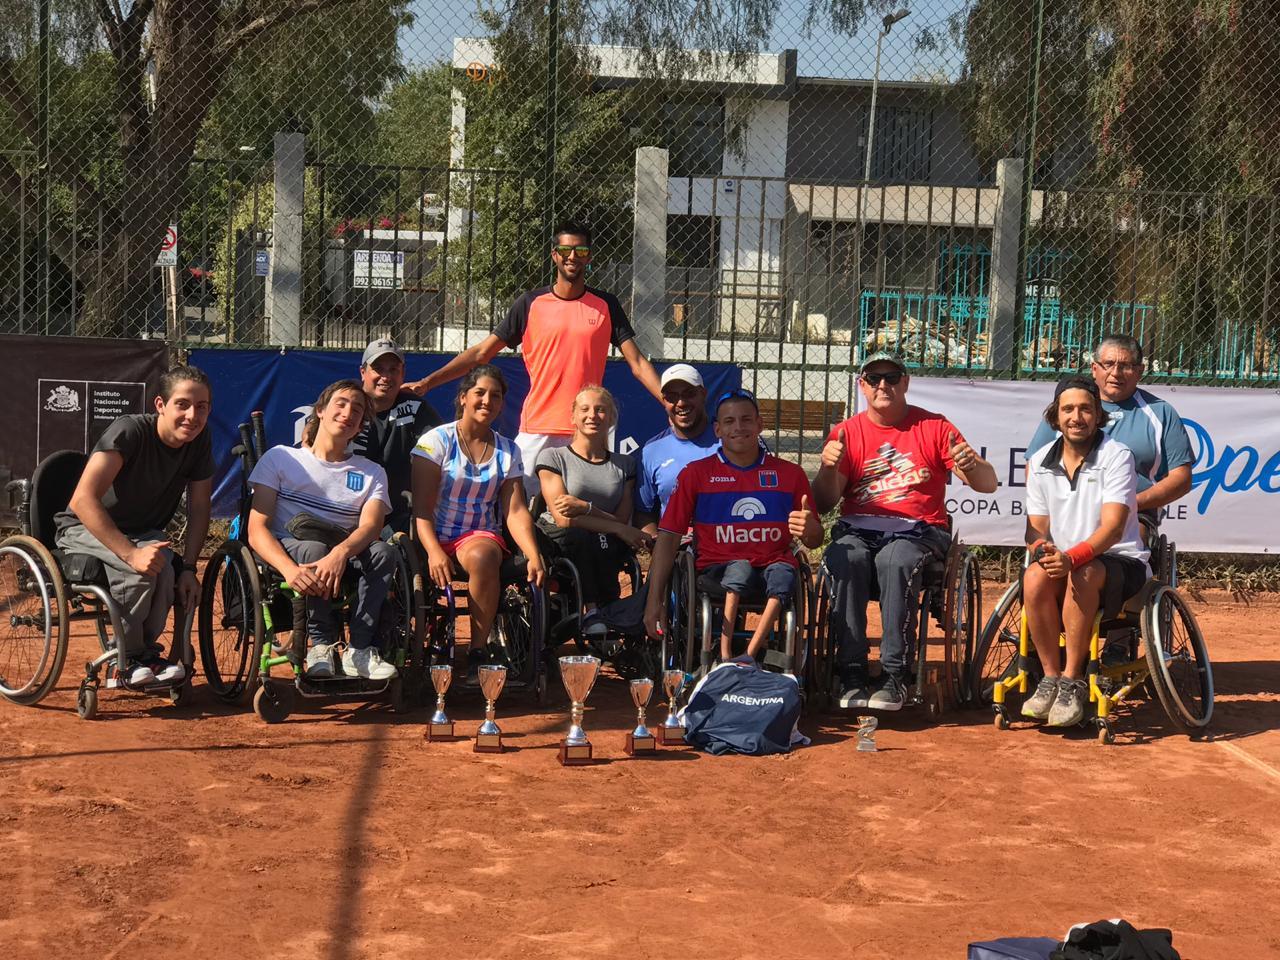 Tenis adaptado: Ledesma, campeón en Chile